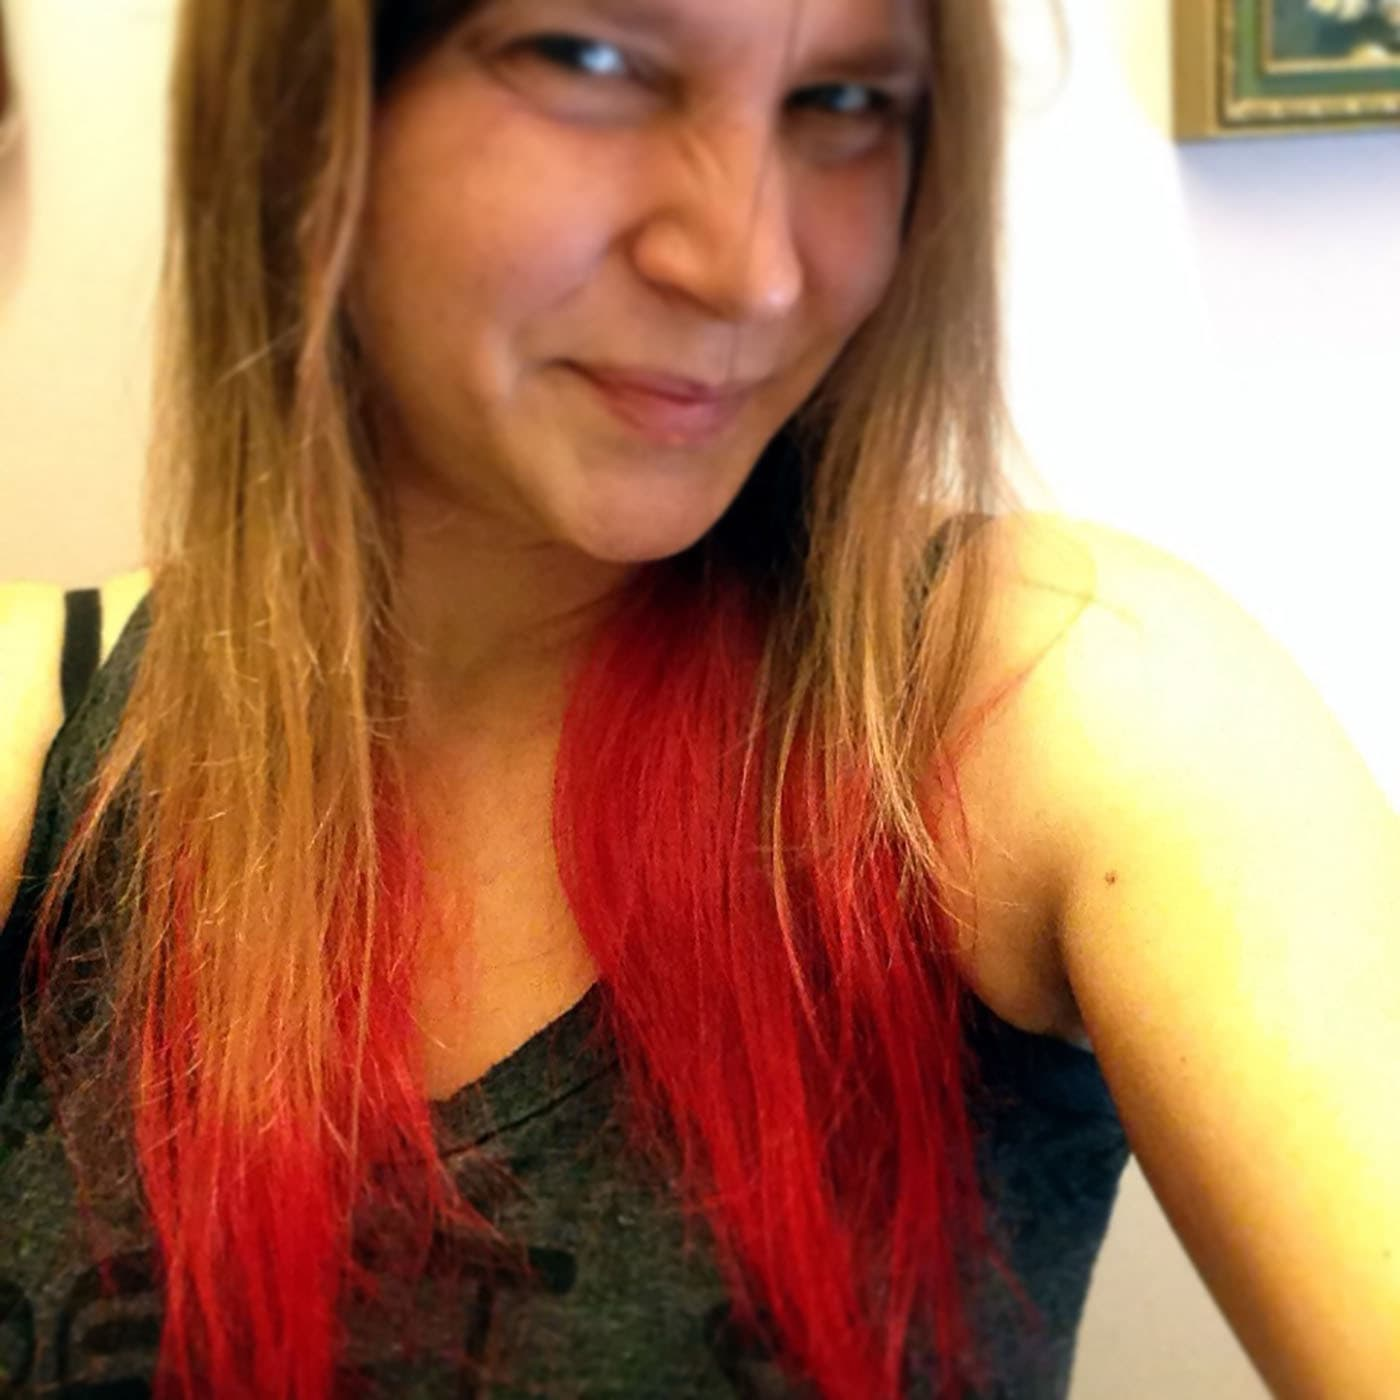 Red hair dye.